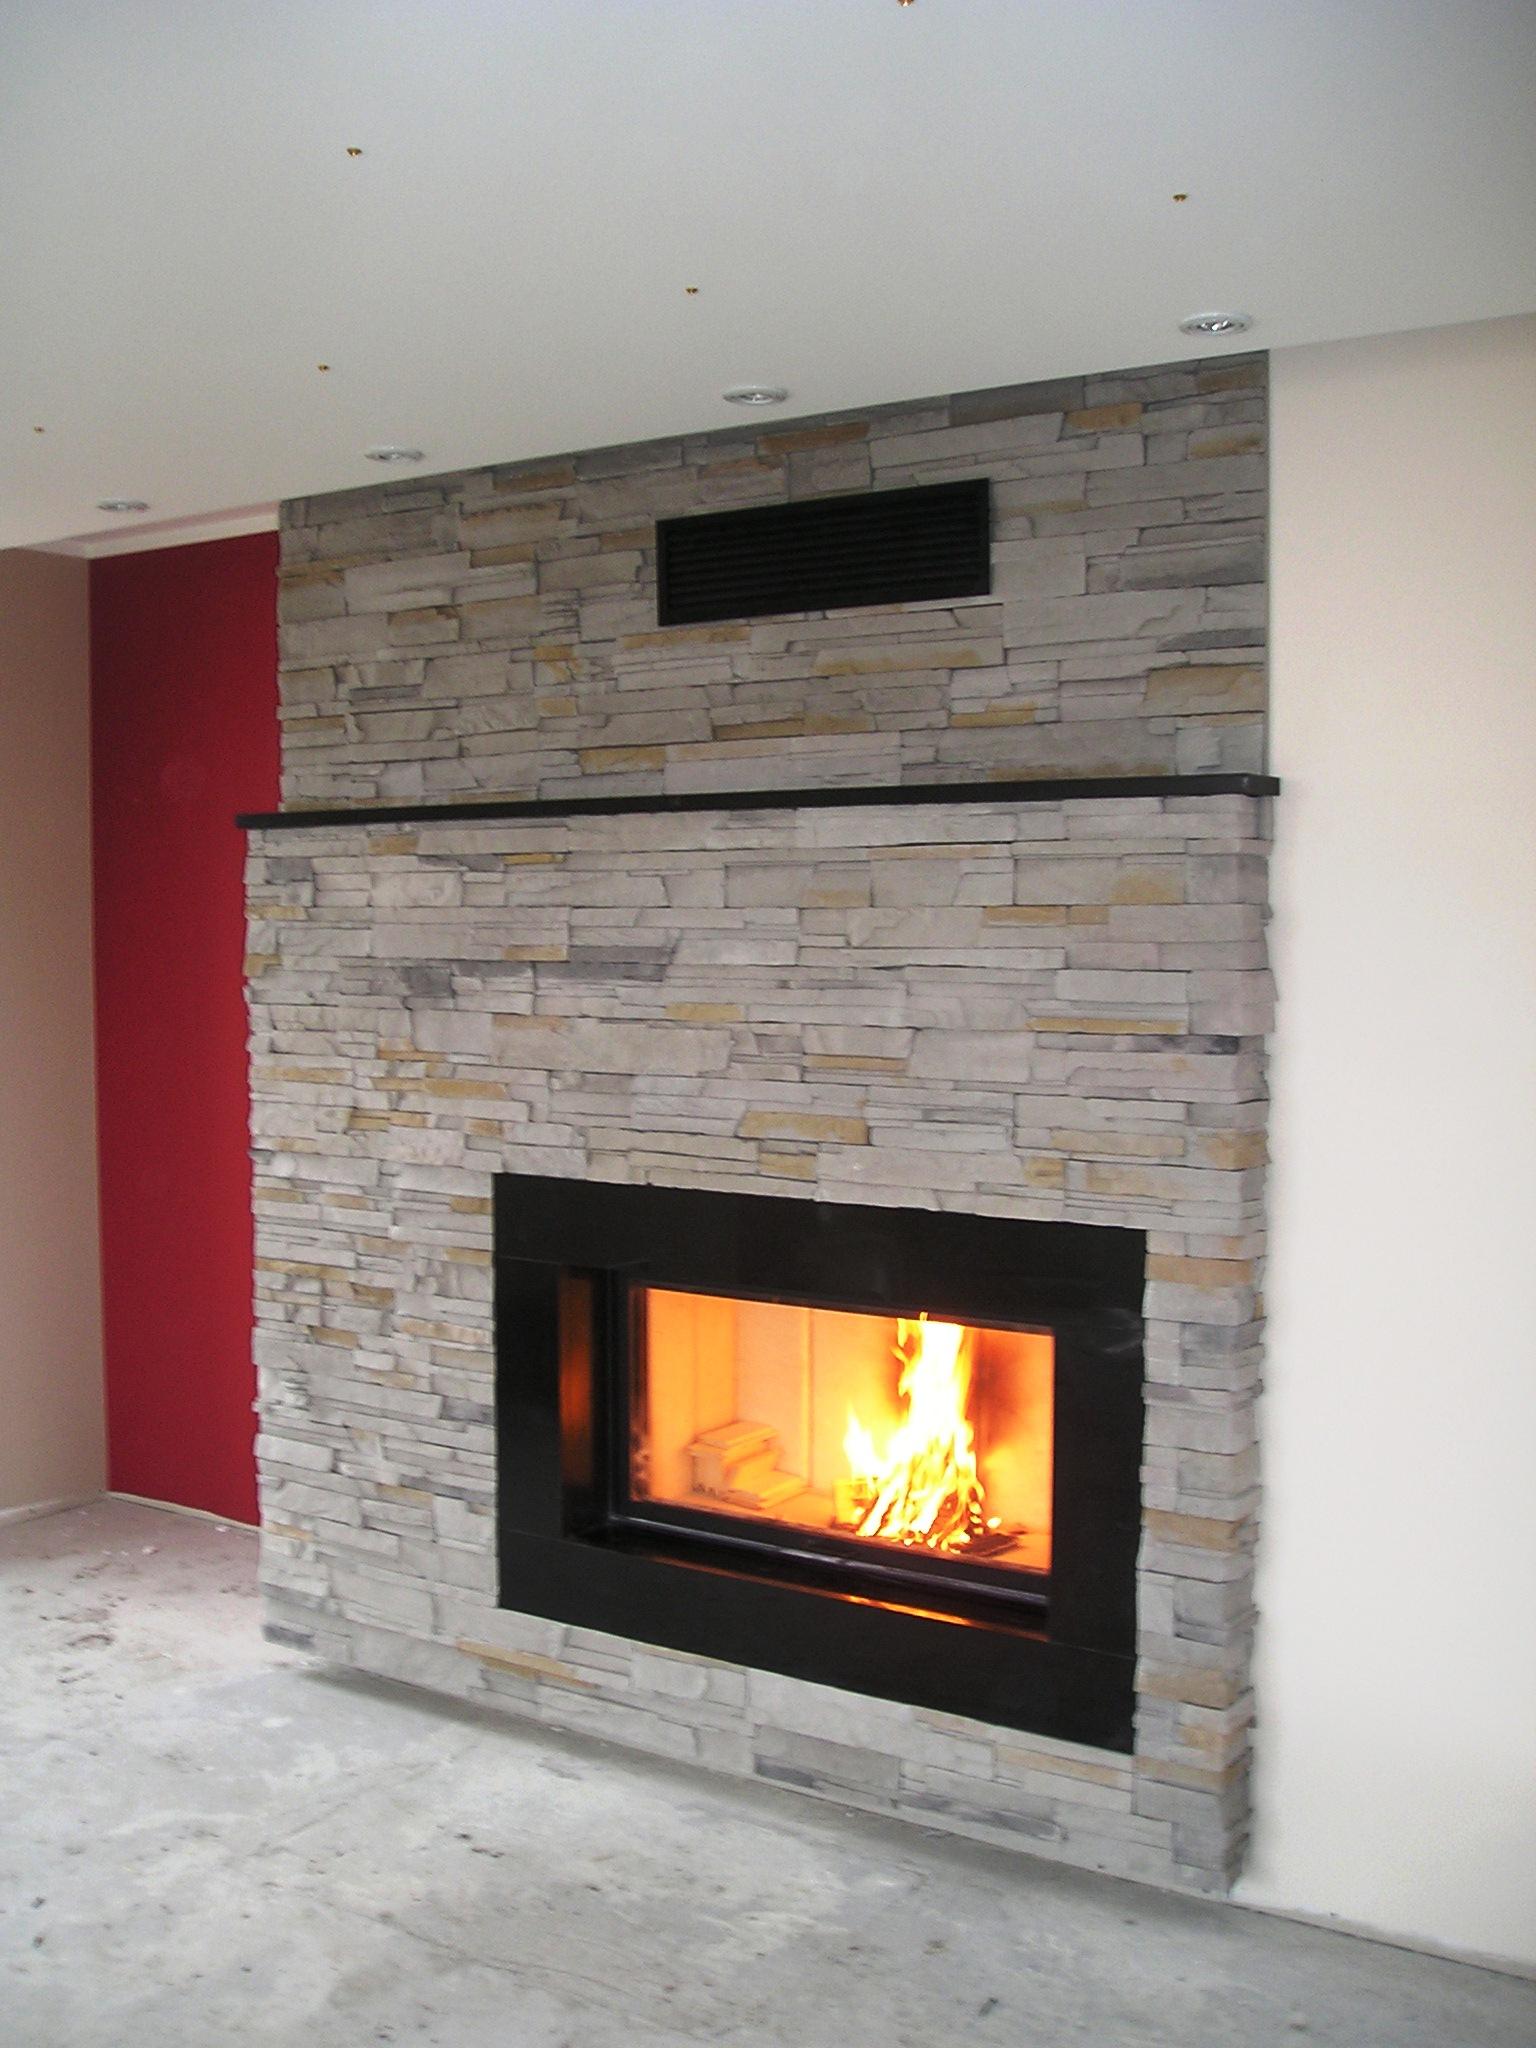 spartherm varia 2lh 4s a jpg 2 188 1 642 pixels wood fires